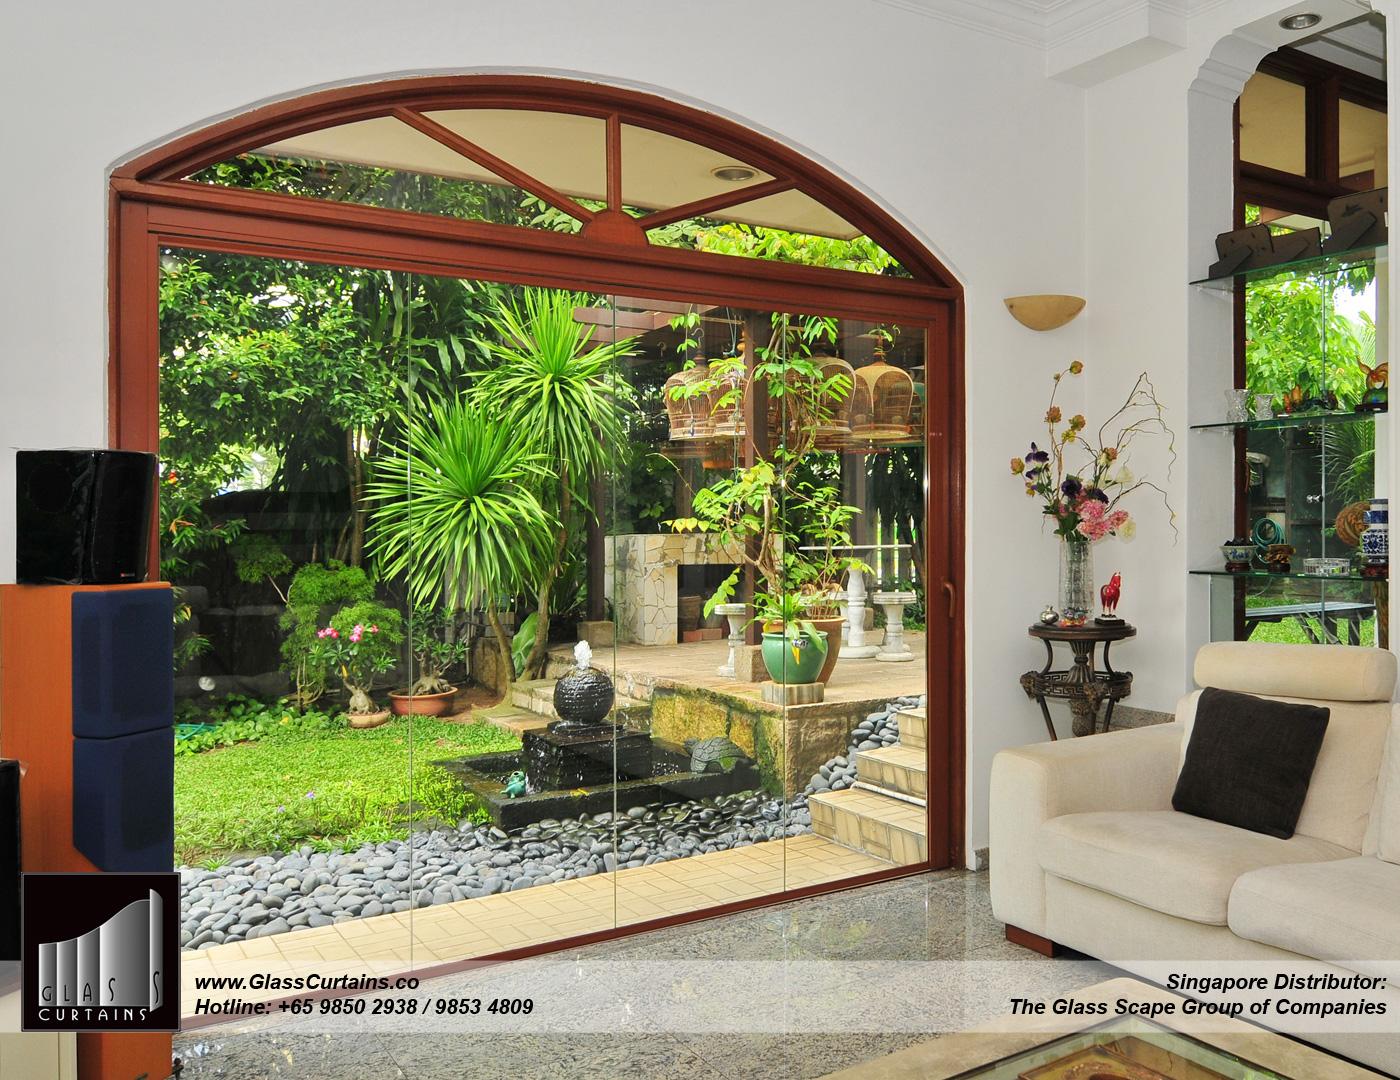 patio-140924.jpg